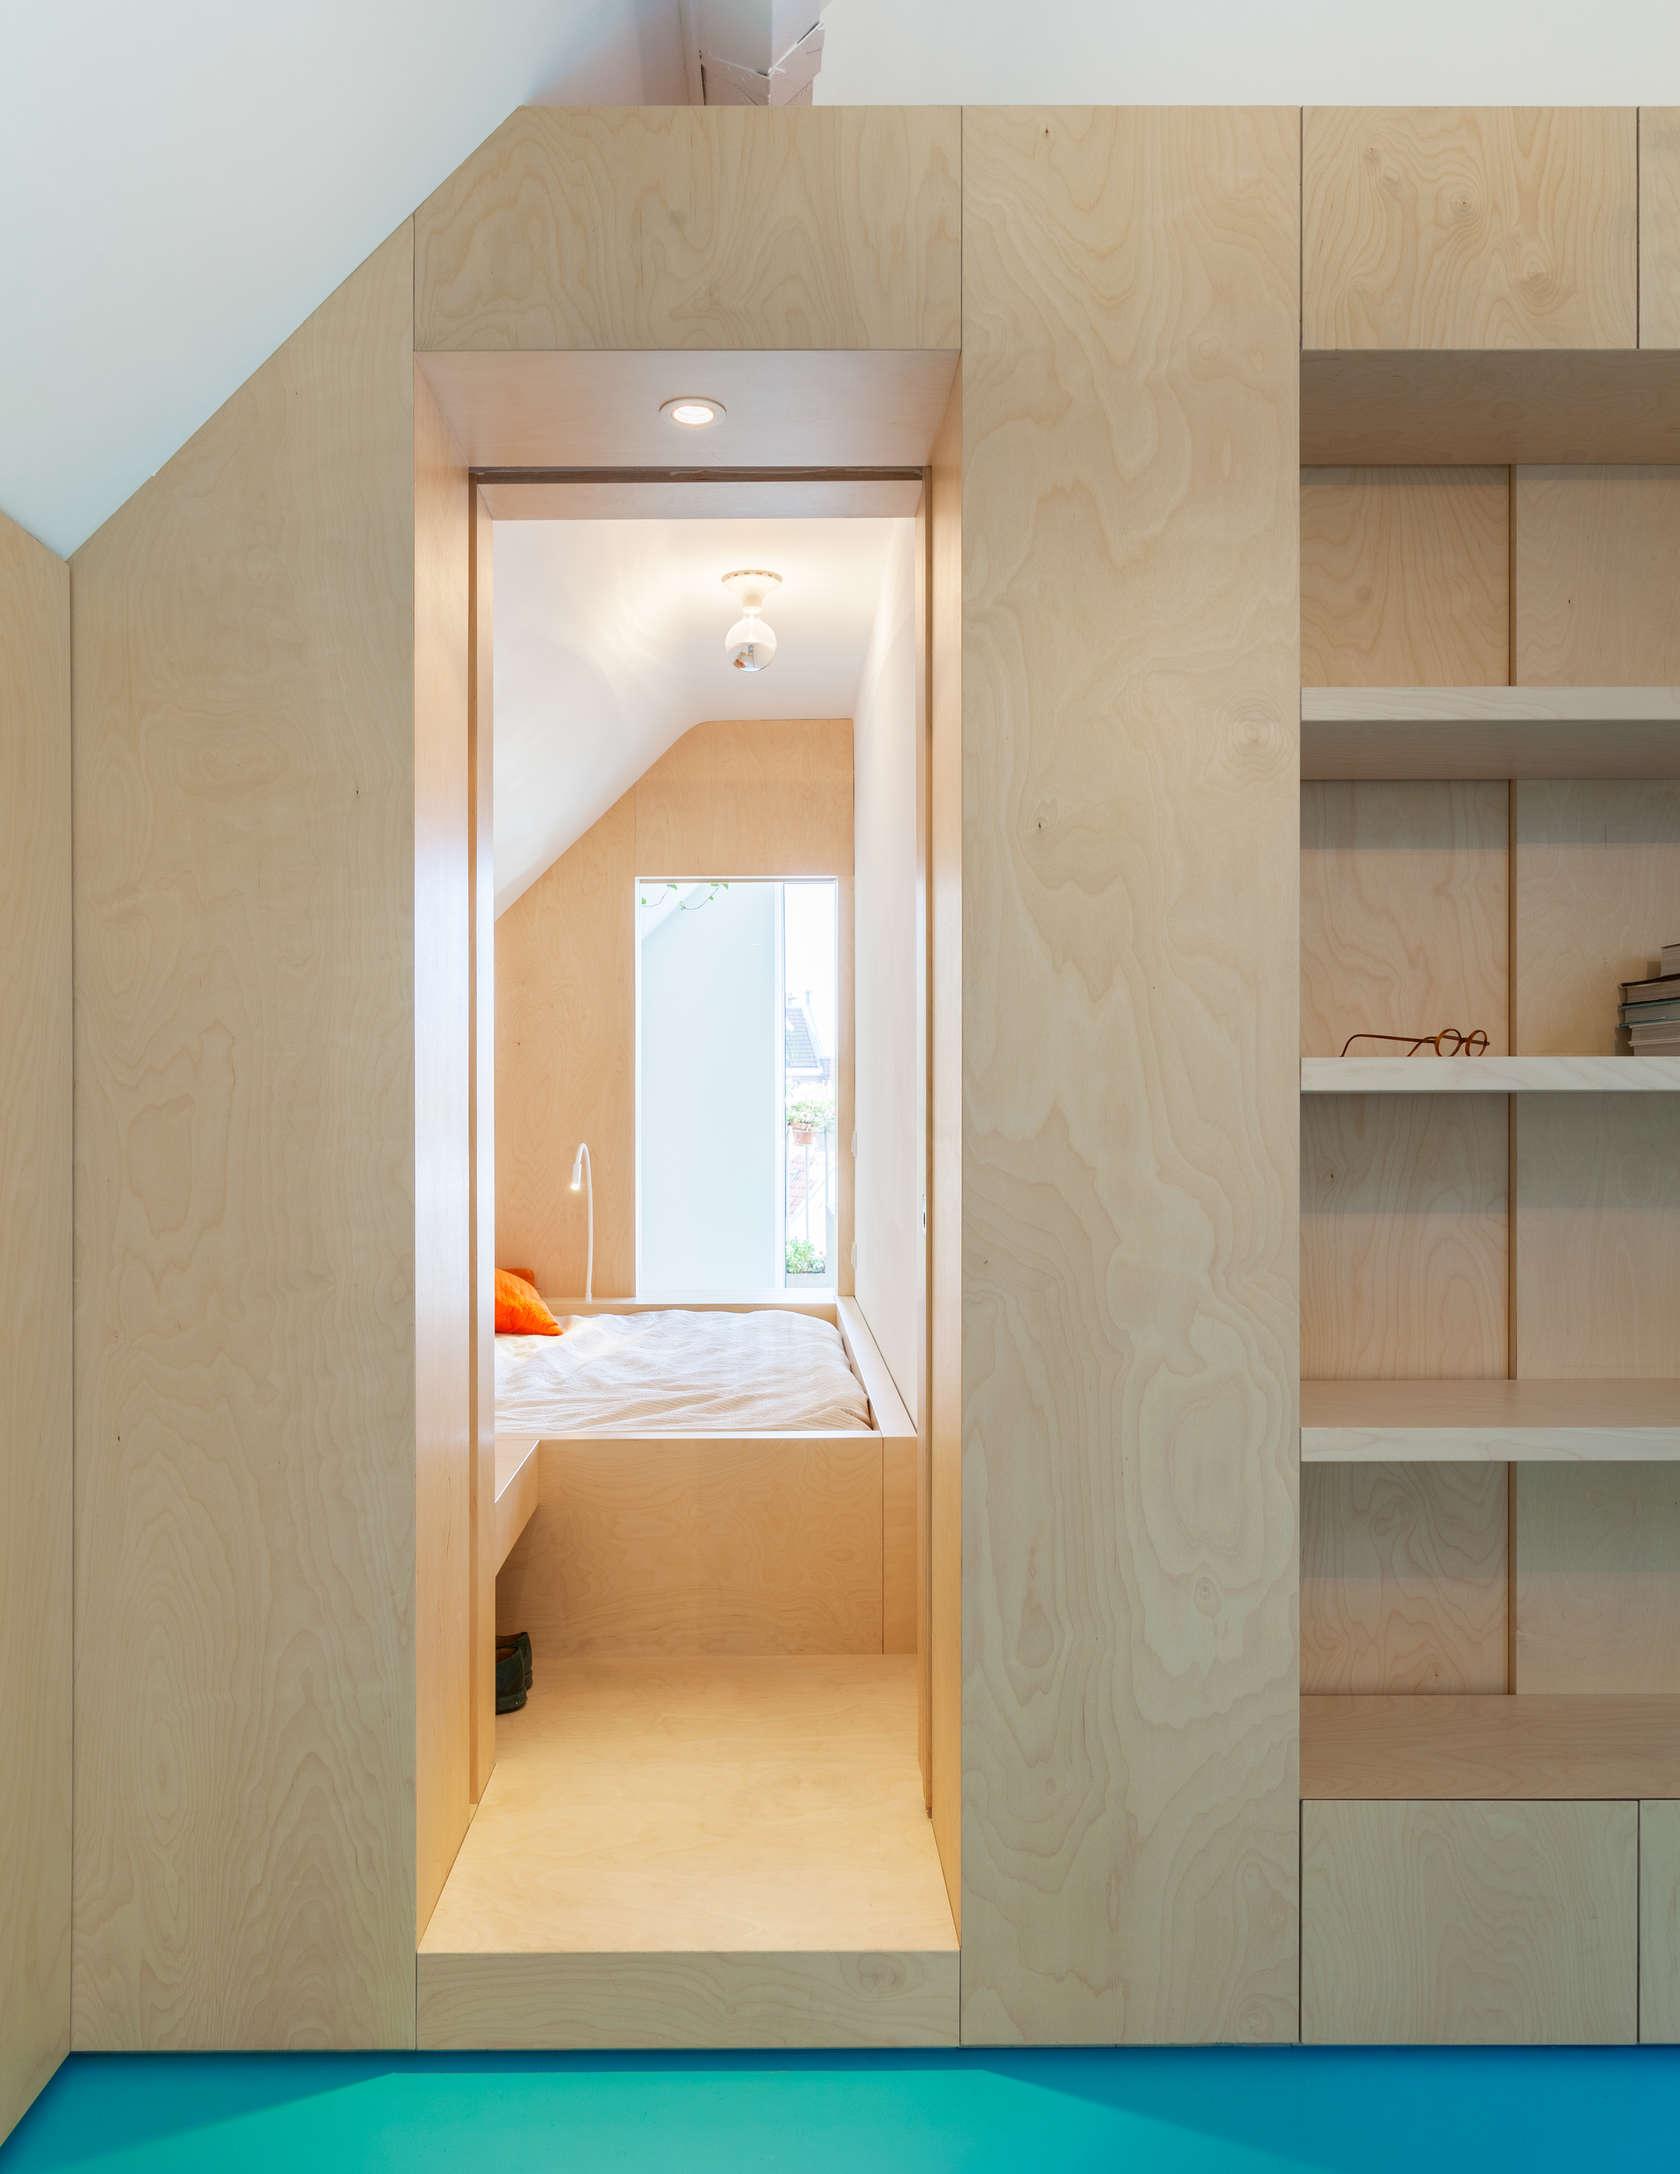 Urban loft amsterdam architizer - Nachtkastje voor loftbed ...